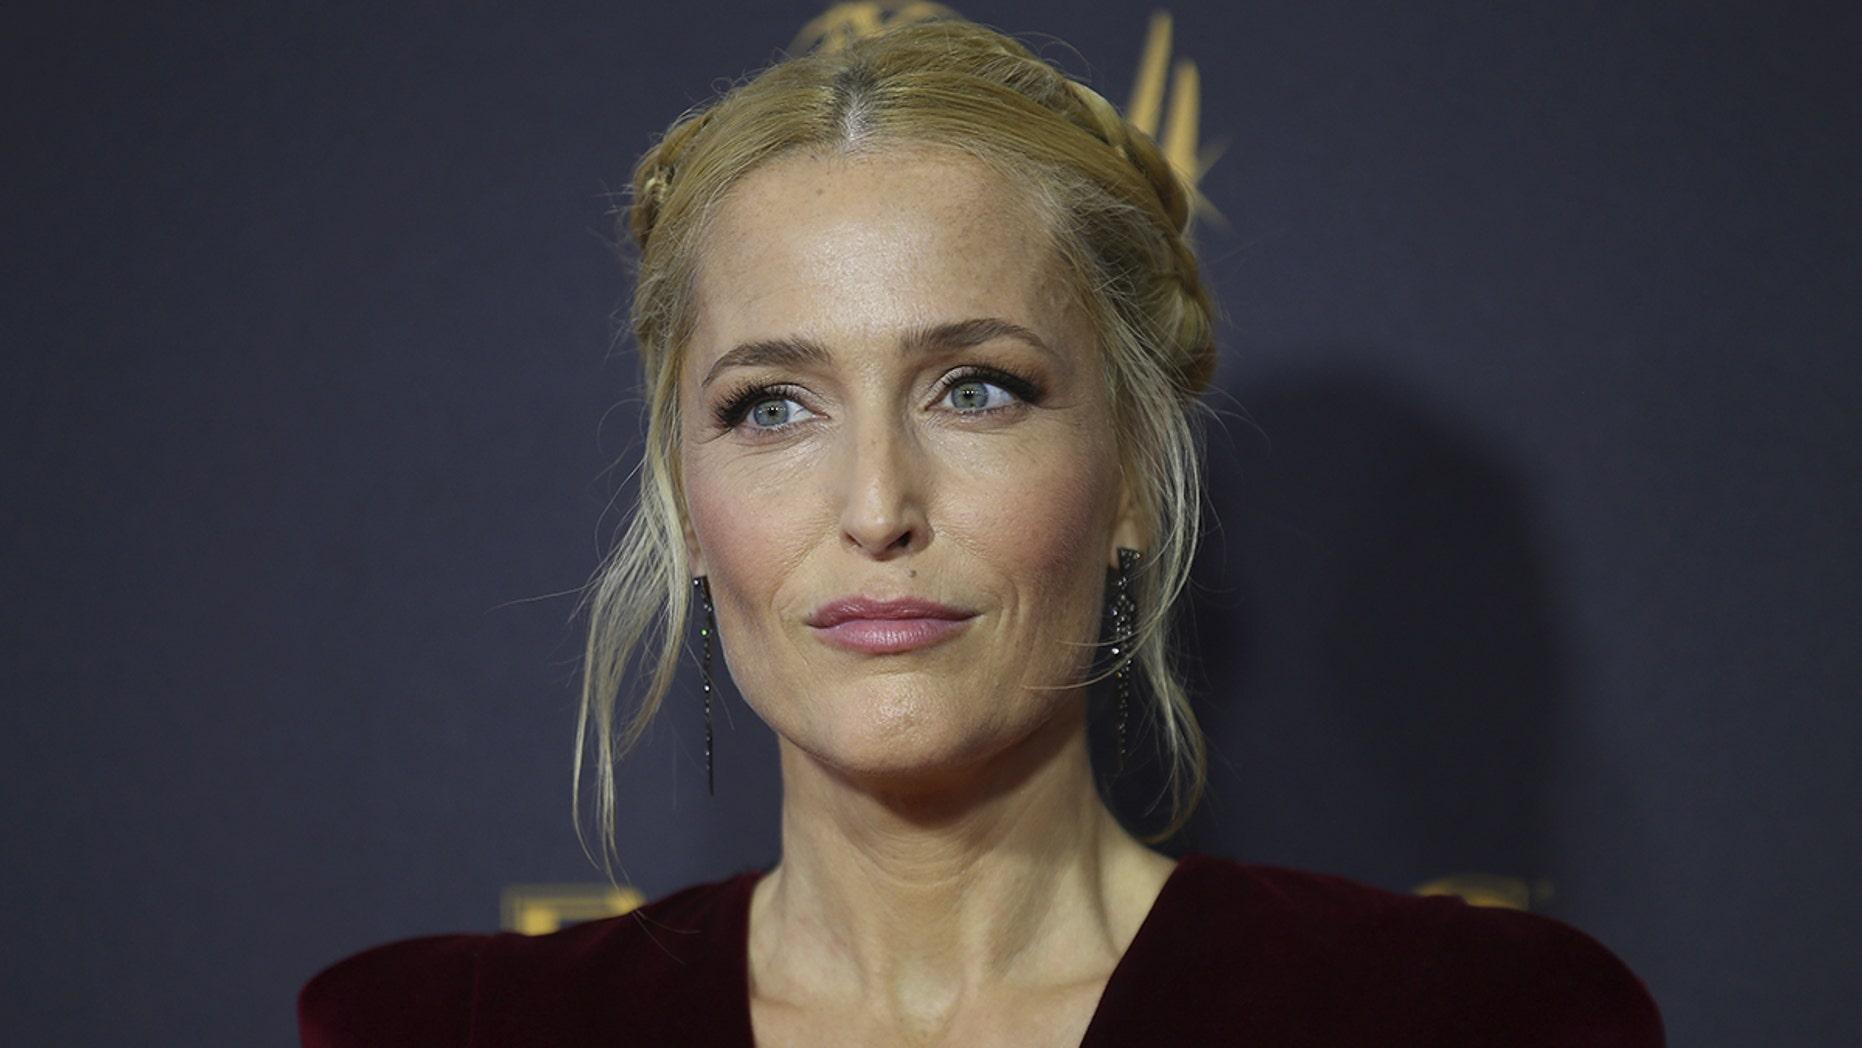 69th Primetime Emmy Awards – Arrivals – Los Angeles, California, U.S., 17/09/2017 -  Gillian Anderson. REUTERS/Mike Blake - HP1ED9I00T8VK